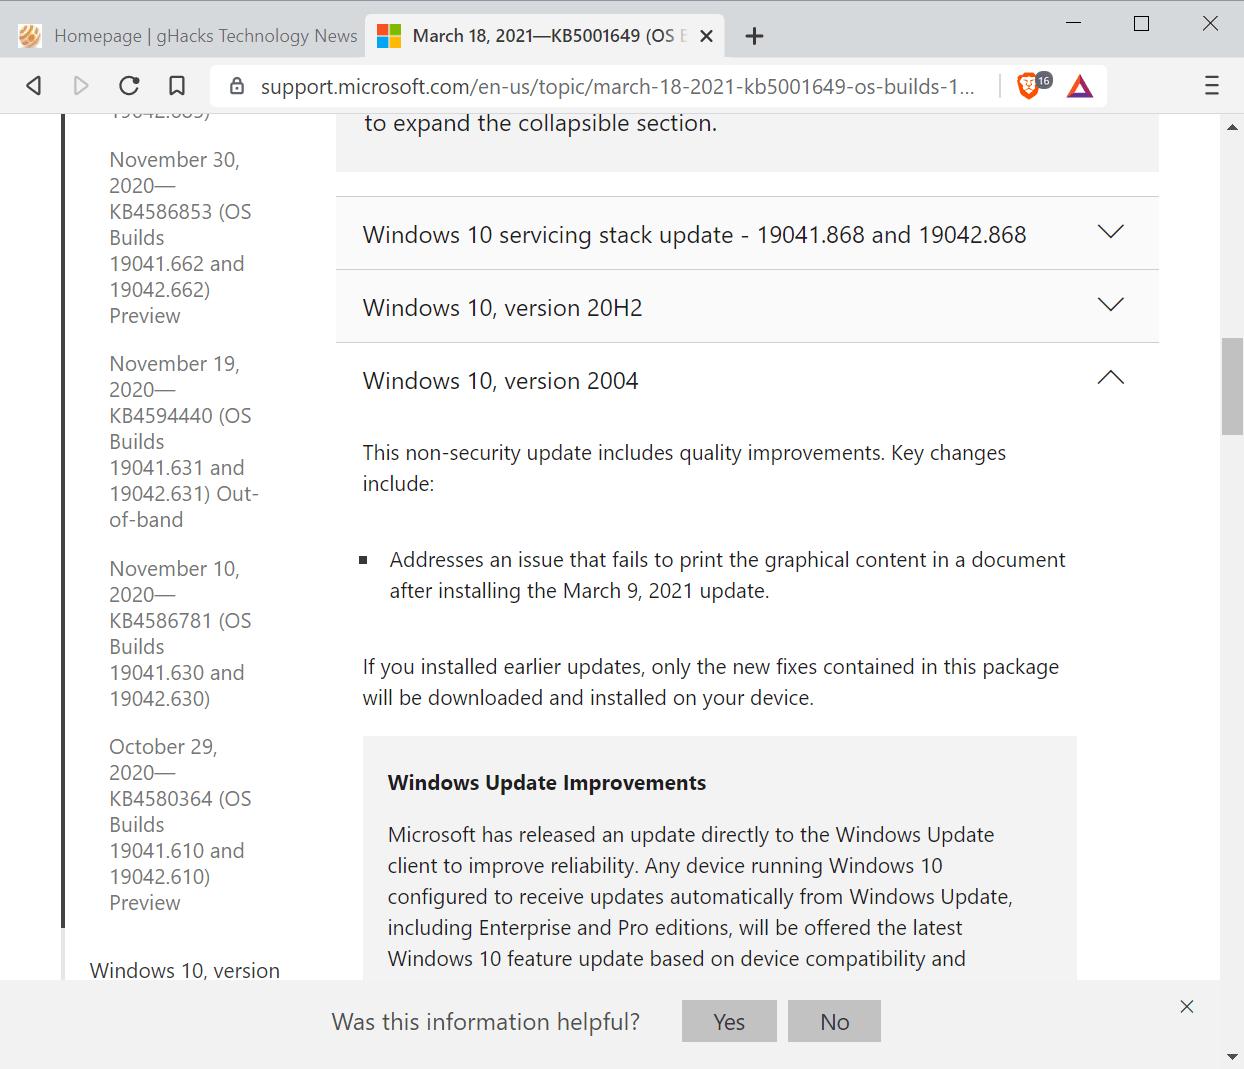 windows 10 printing fix optional update